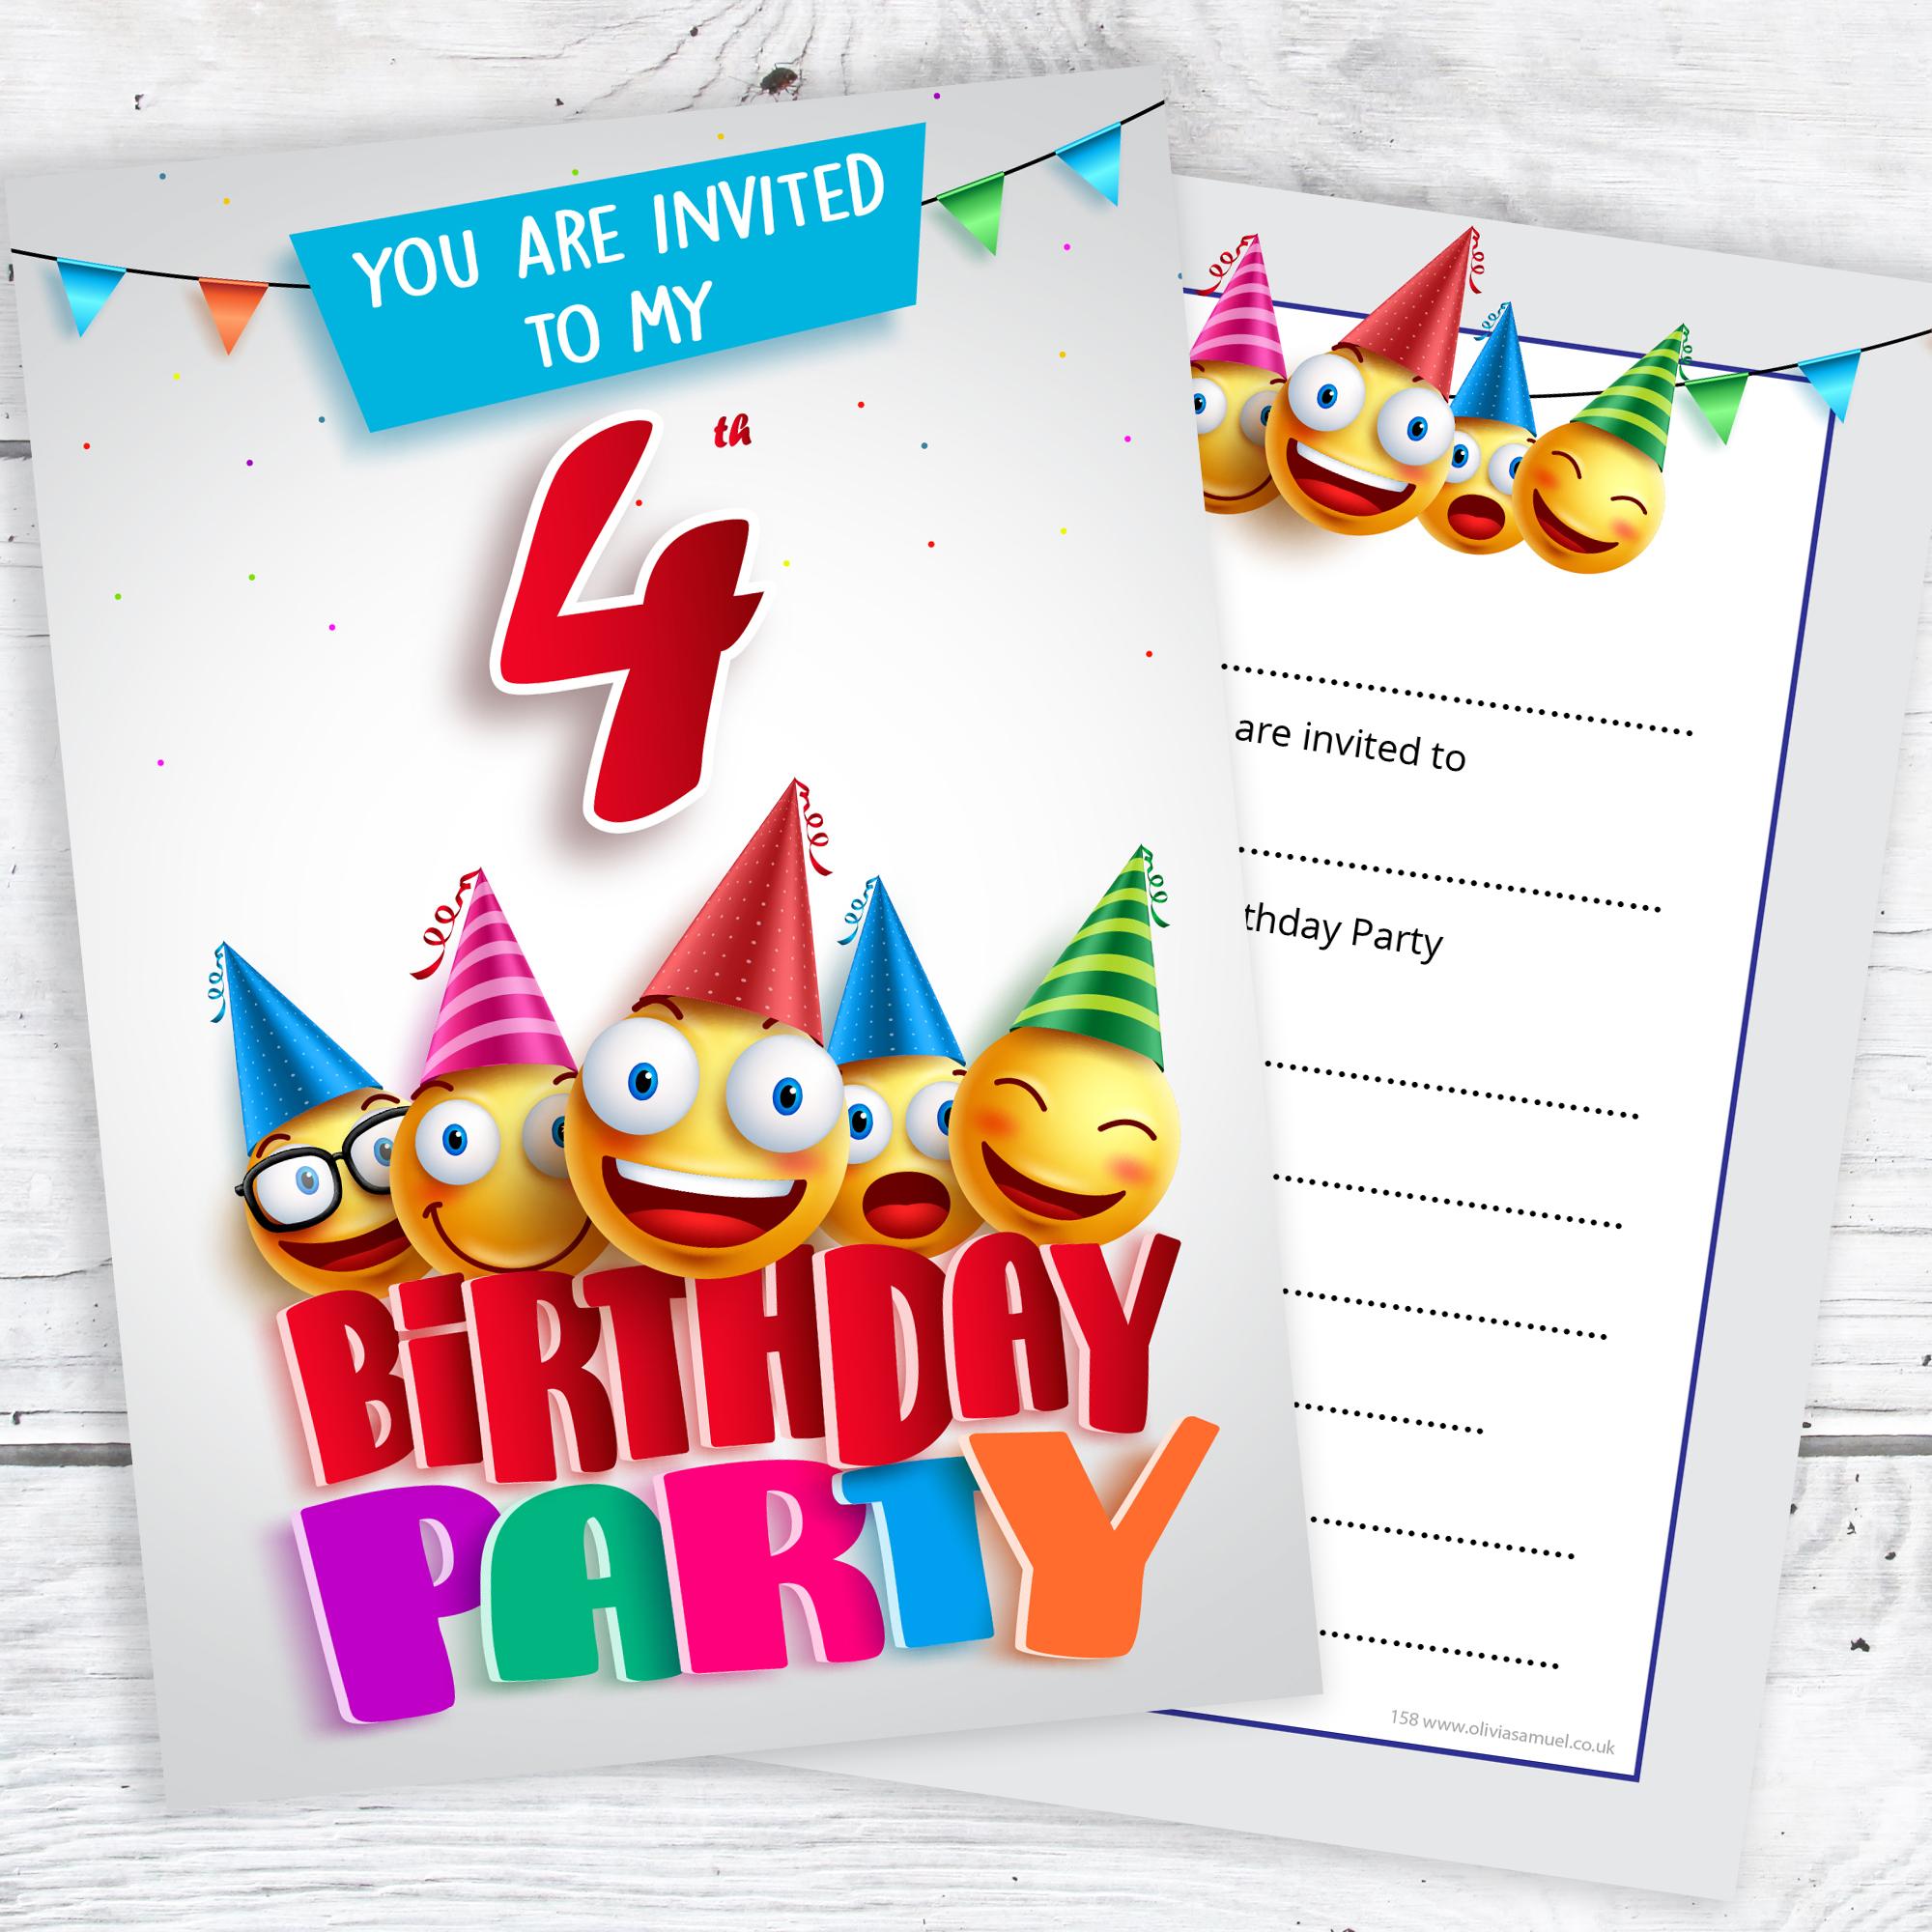 4th birthday party invites emoji style ready to write with 4th birthday party emoji party invitations filmwisefo